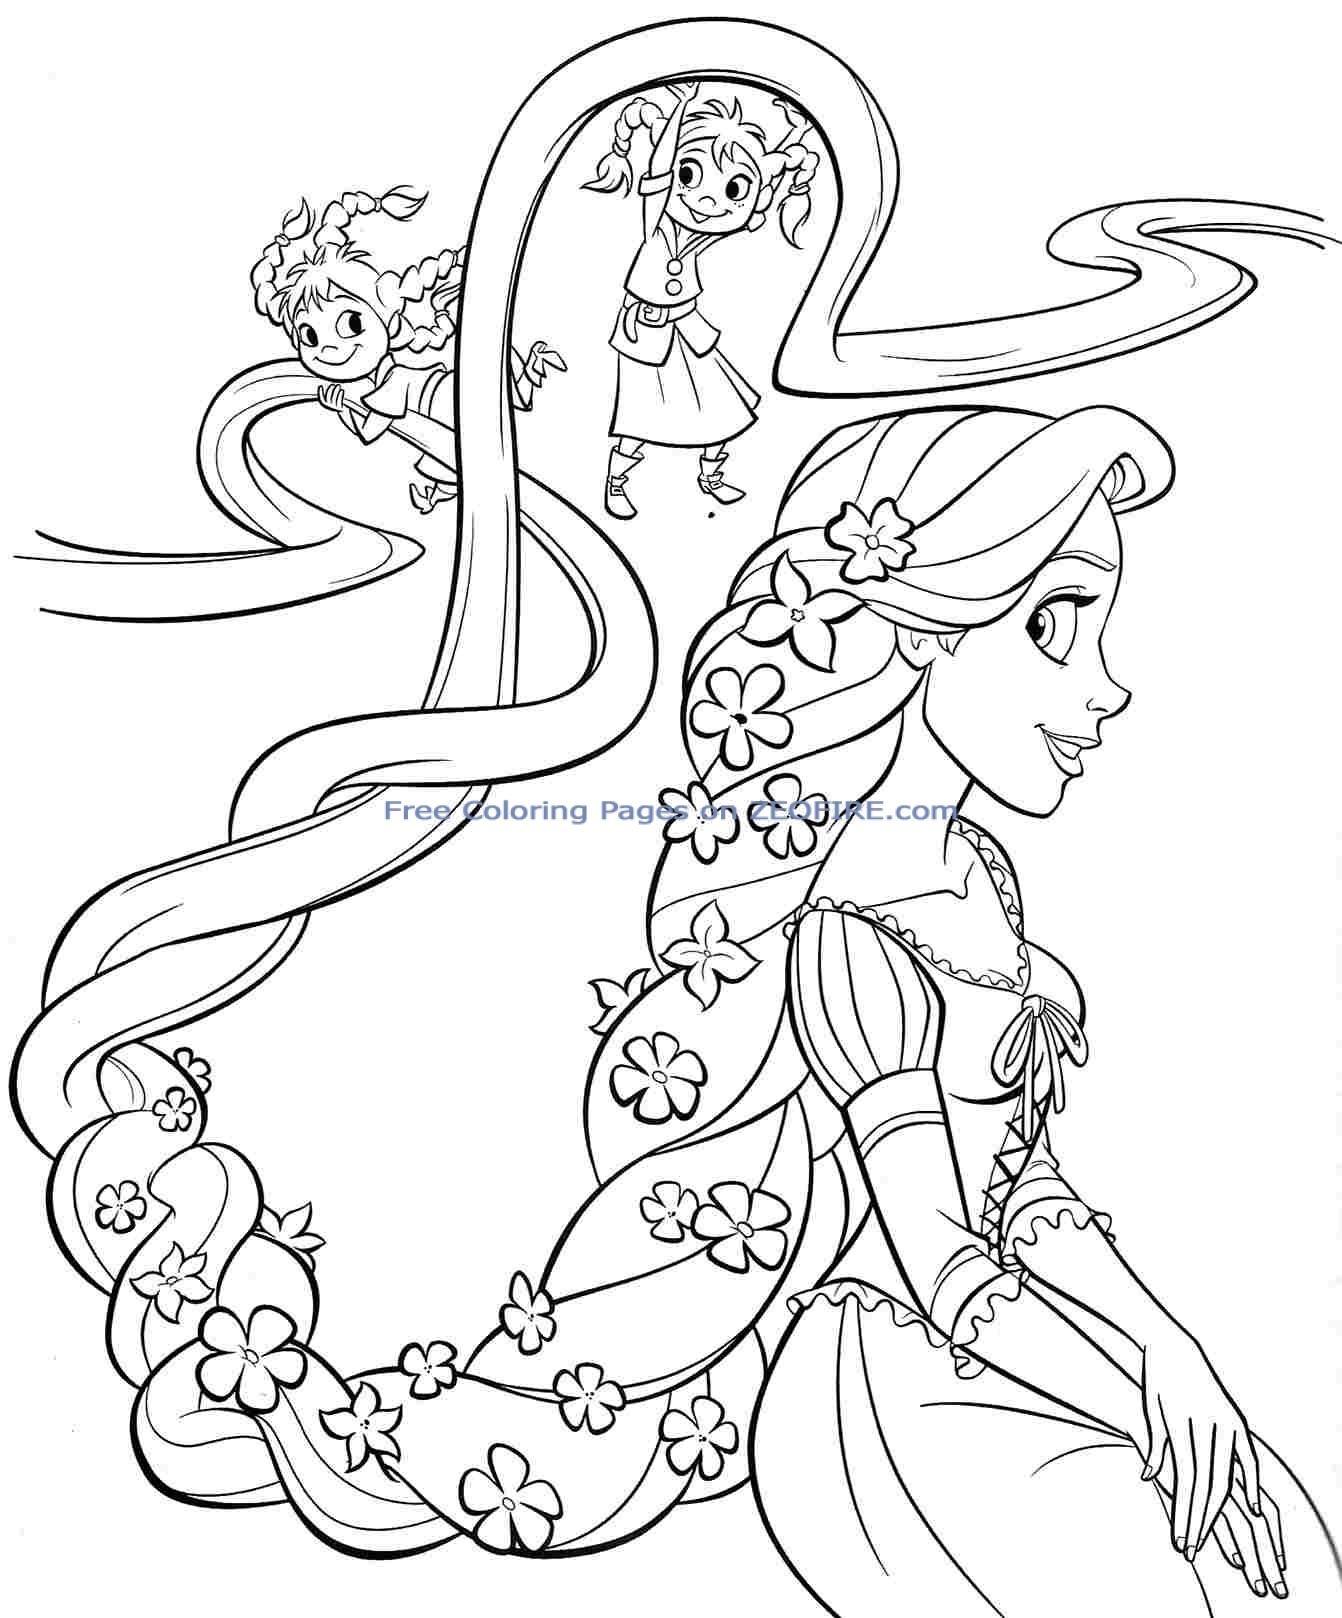 1342x1618 Cute Cartoon Disney Princess Coloring Pages Free Coloring Sheets